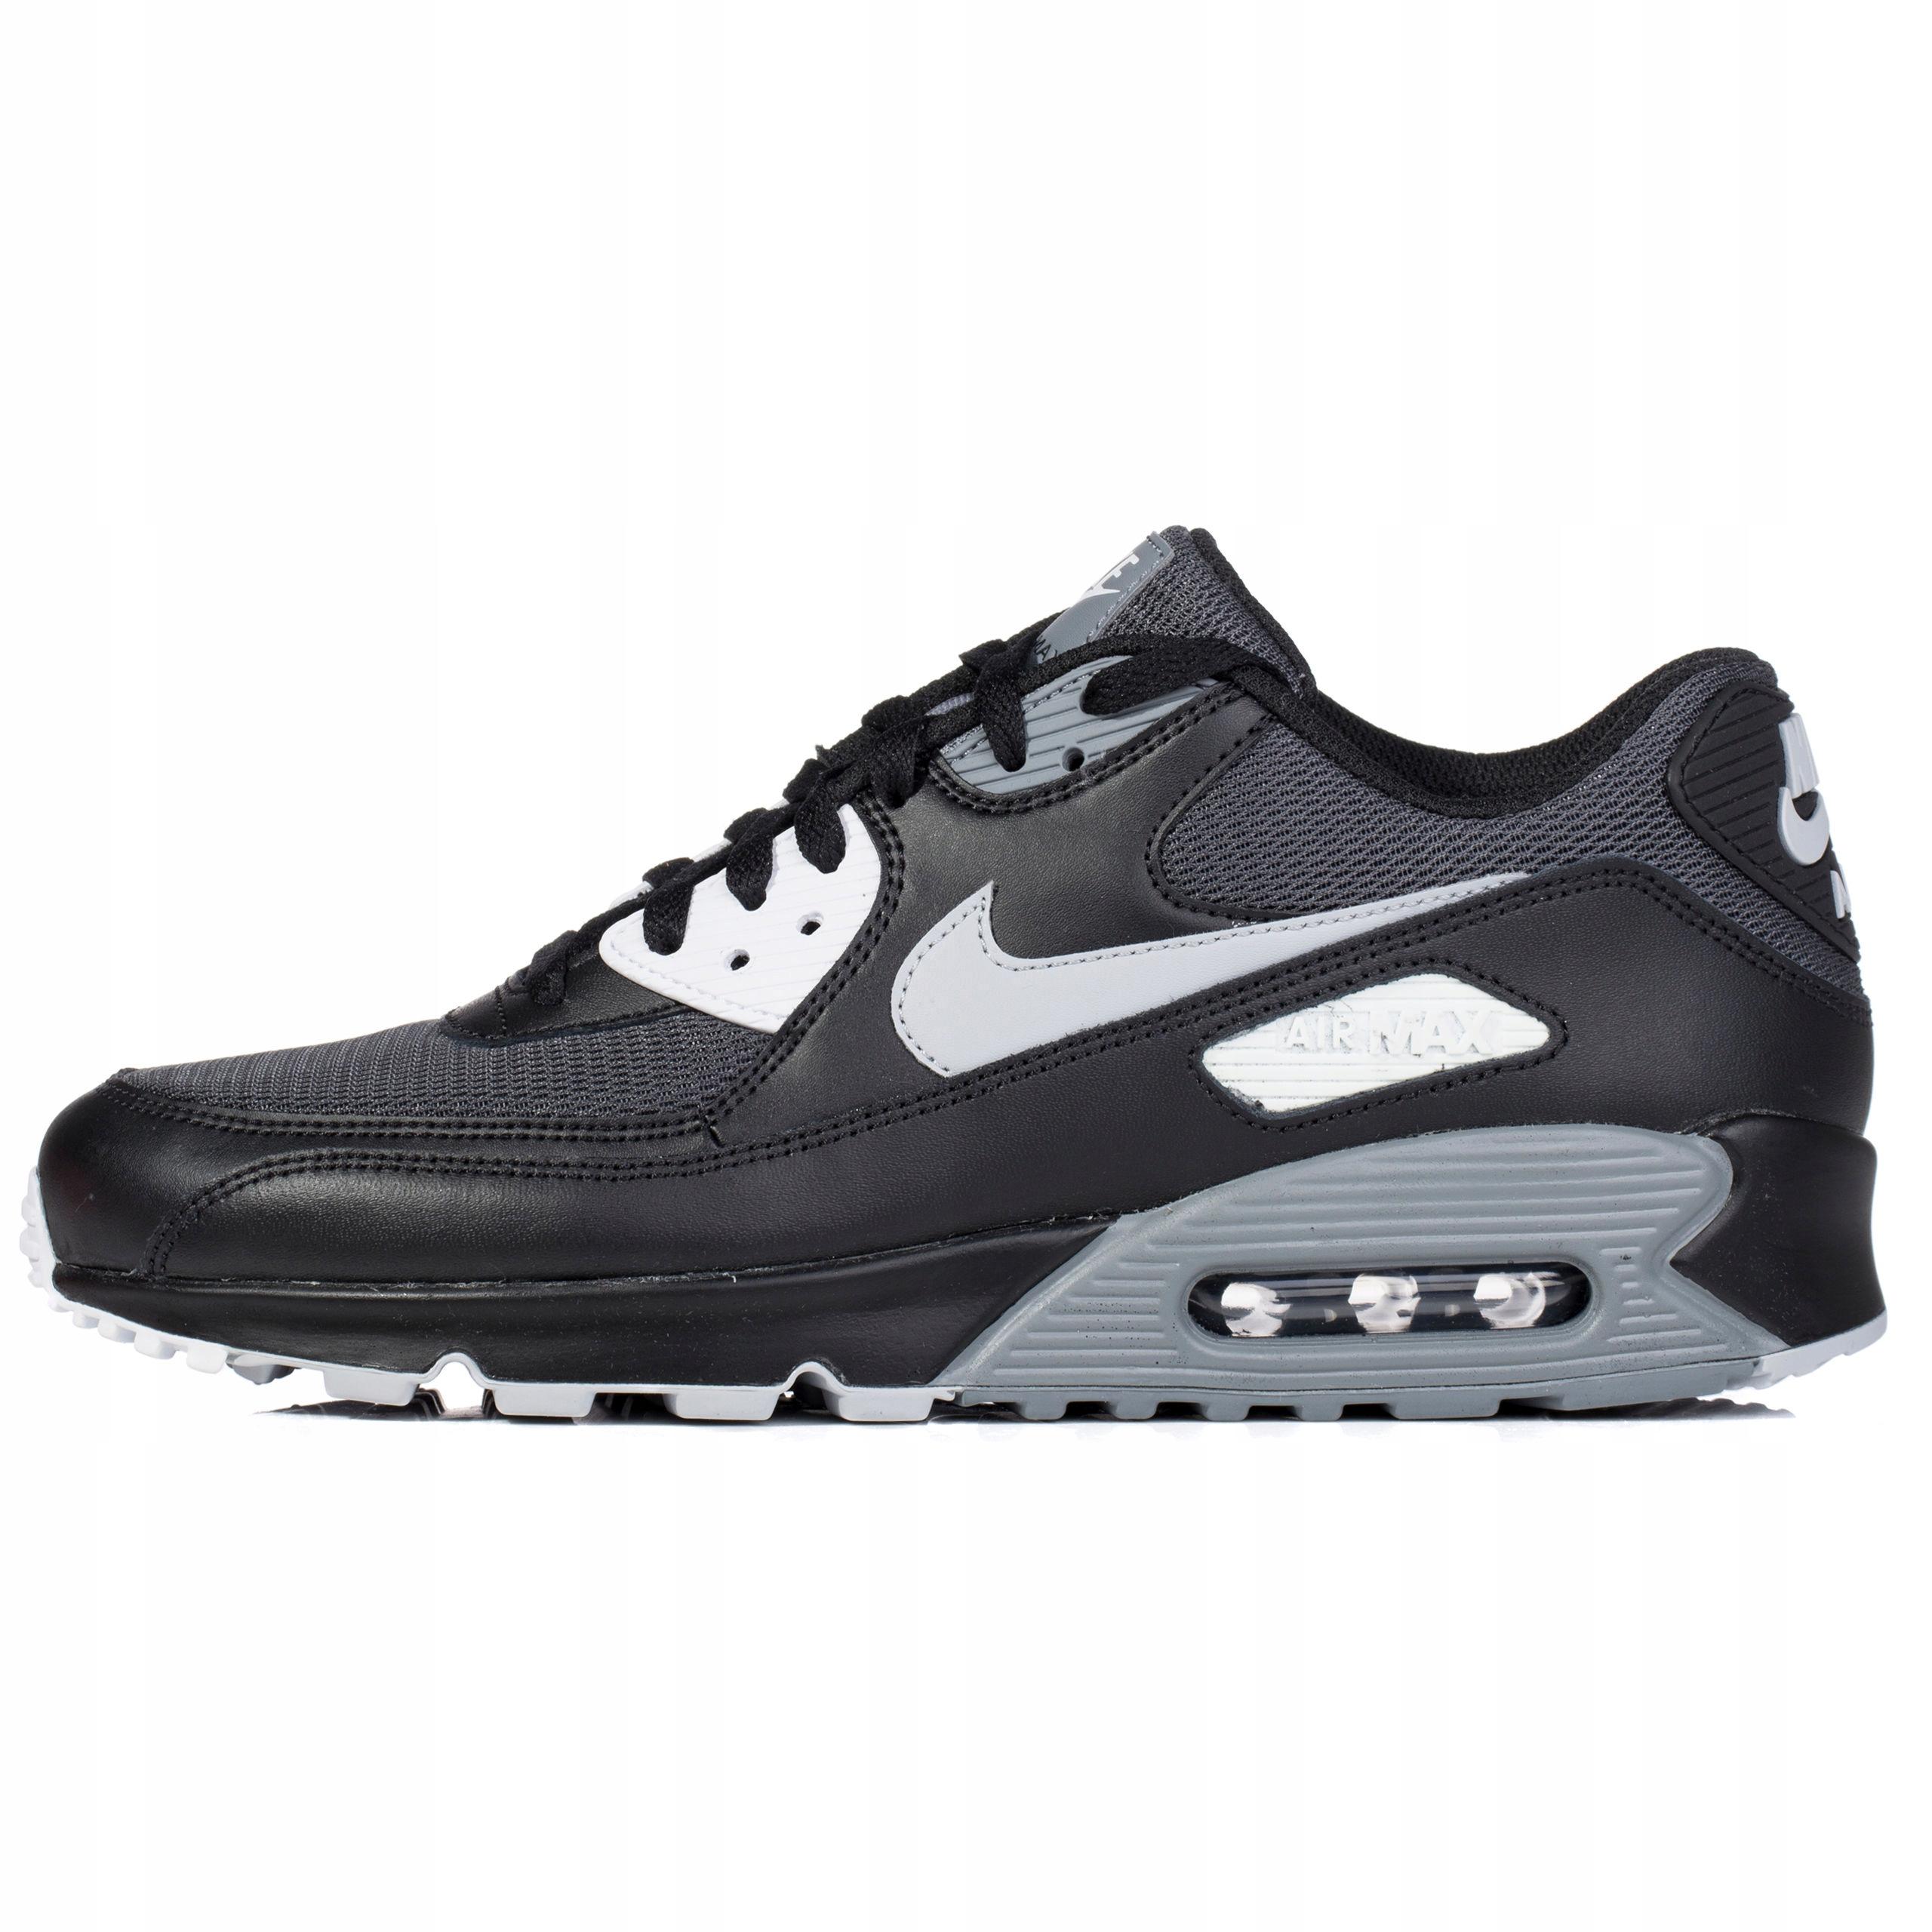 e1fc960f5a82a4 Buty męskie Nike Air Max 90 Essential AJ1285-003 - 7559053806 ...